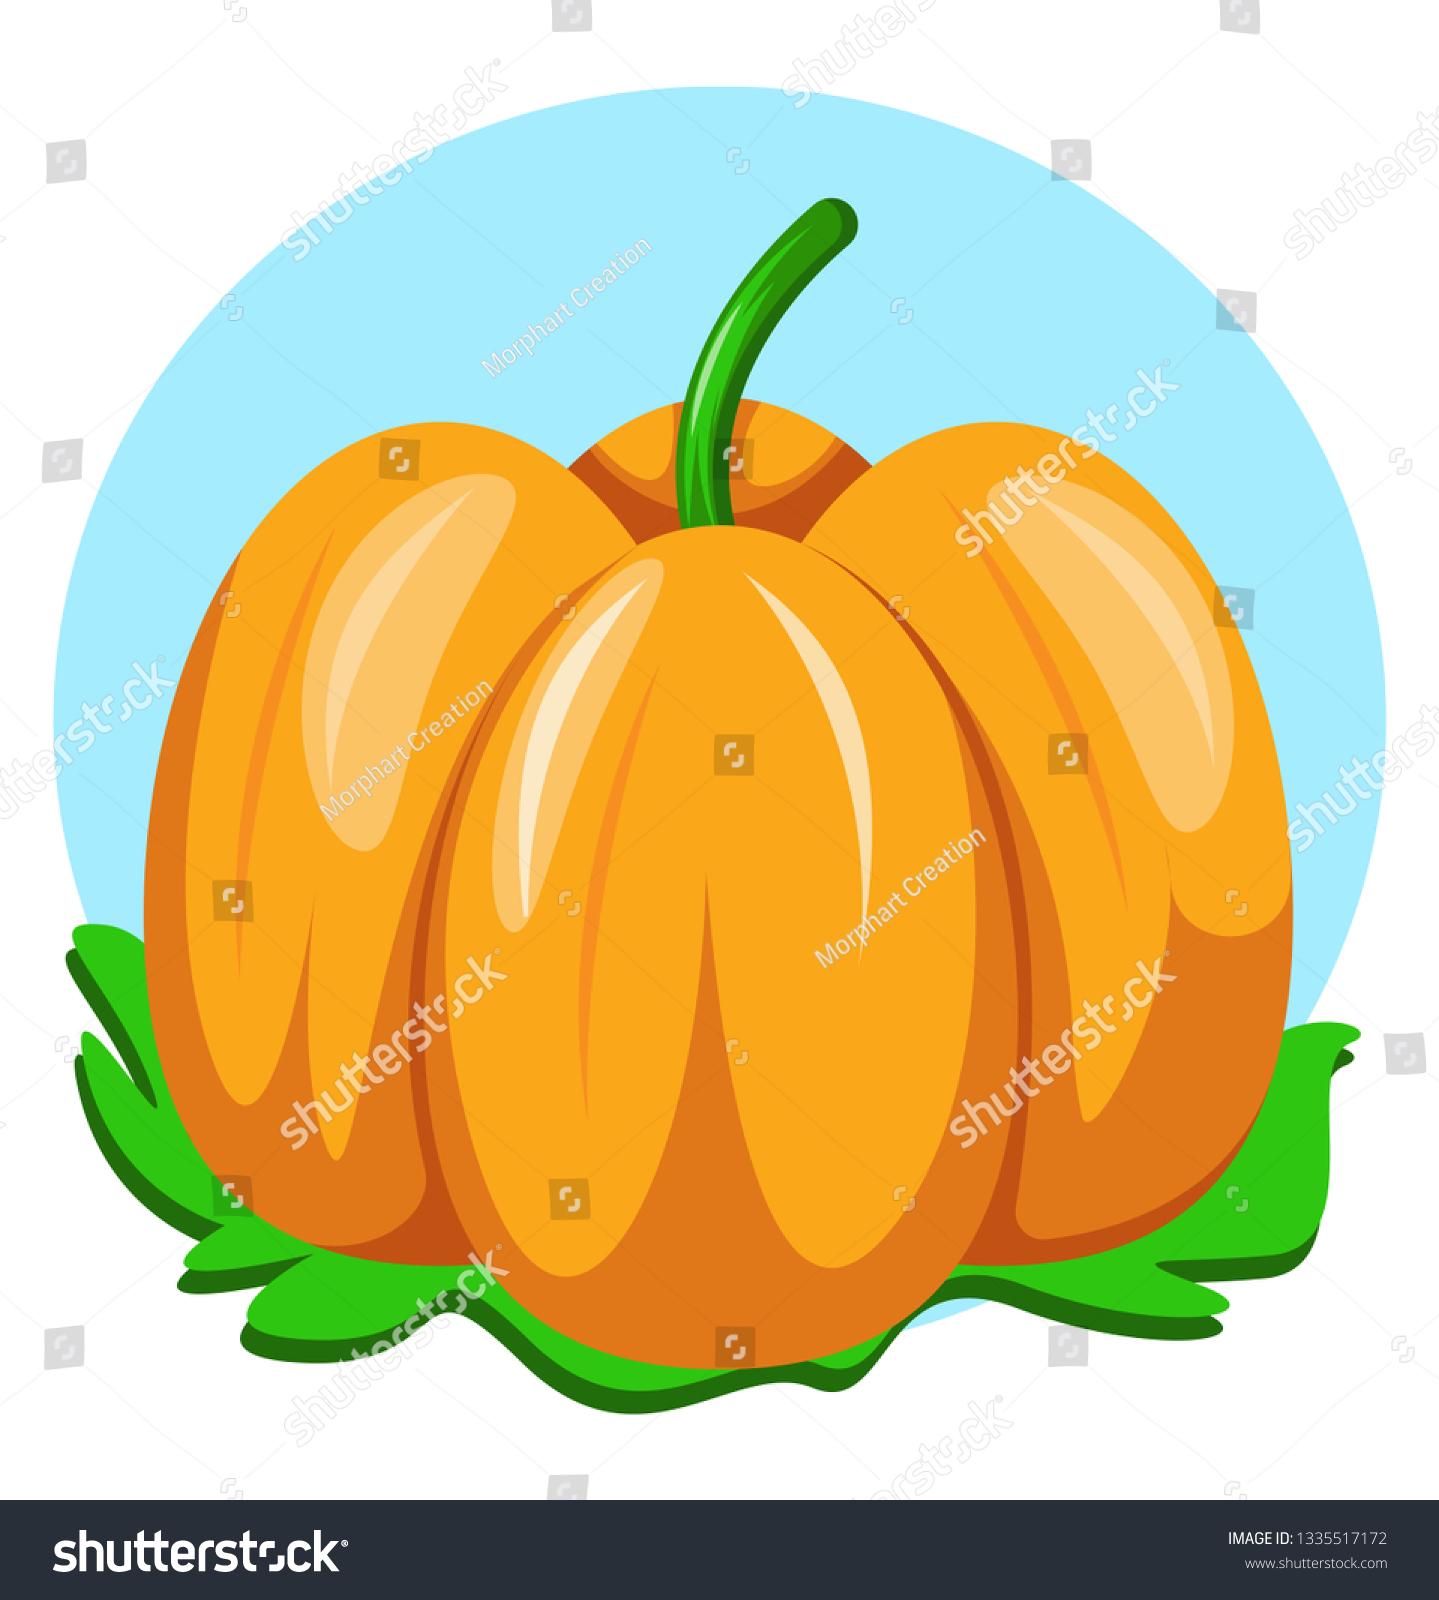 Pumpkin Stem Blue Background Green Leaf Stock Vector Royalty Free 1335517172